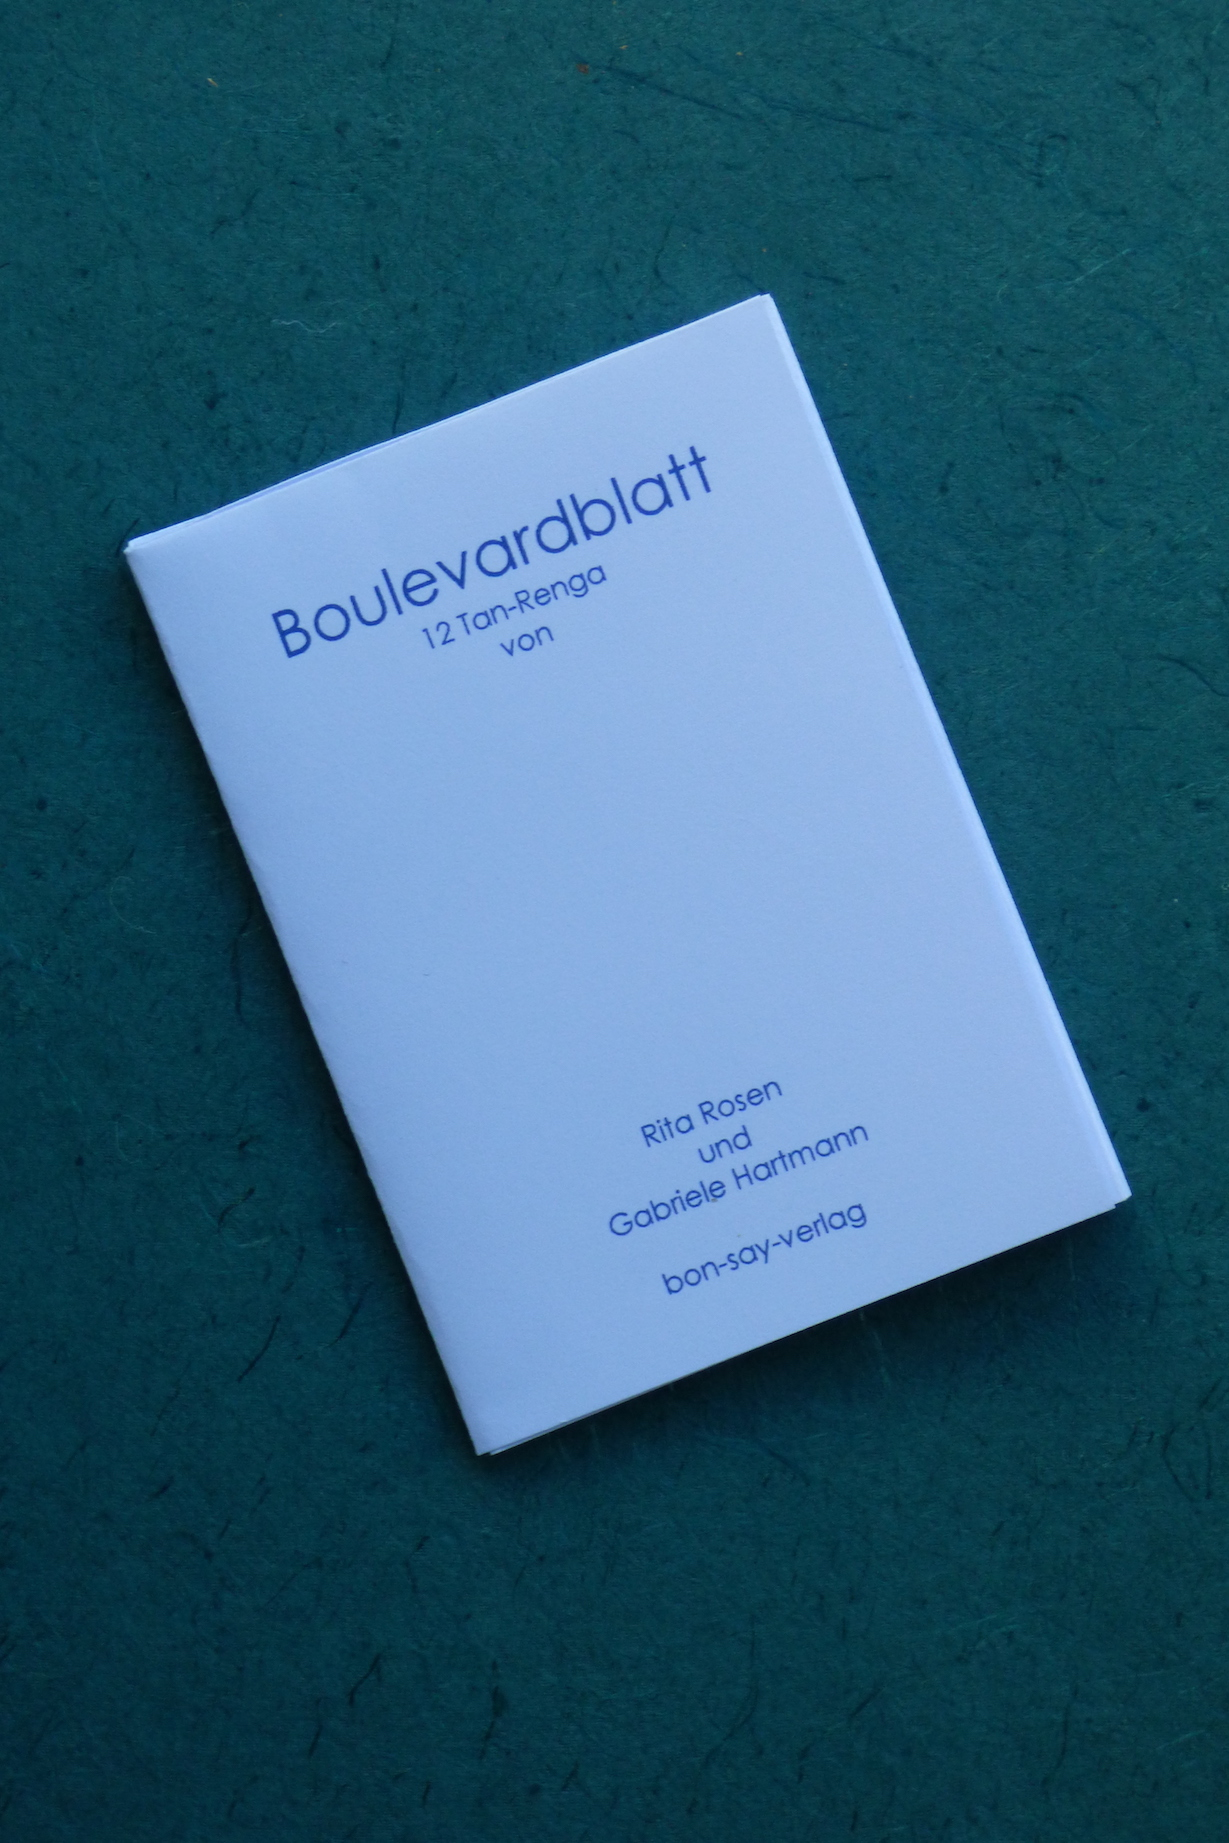 Boulevardblatt